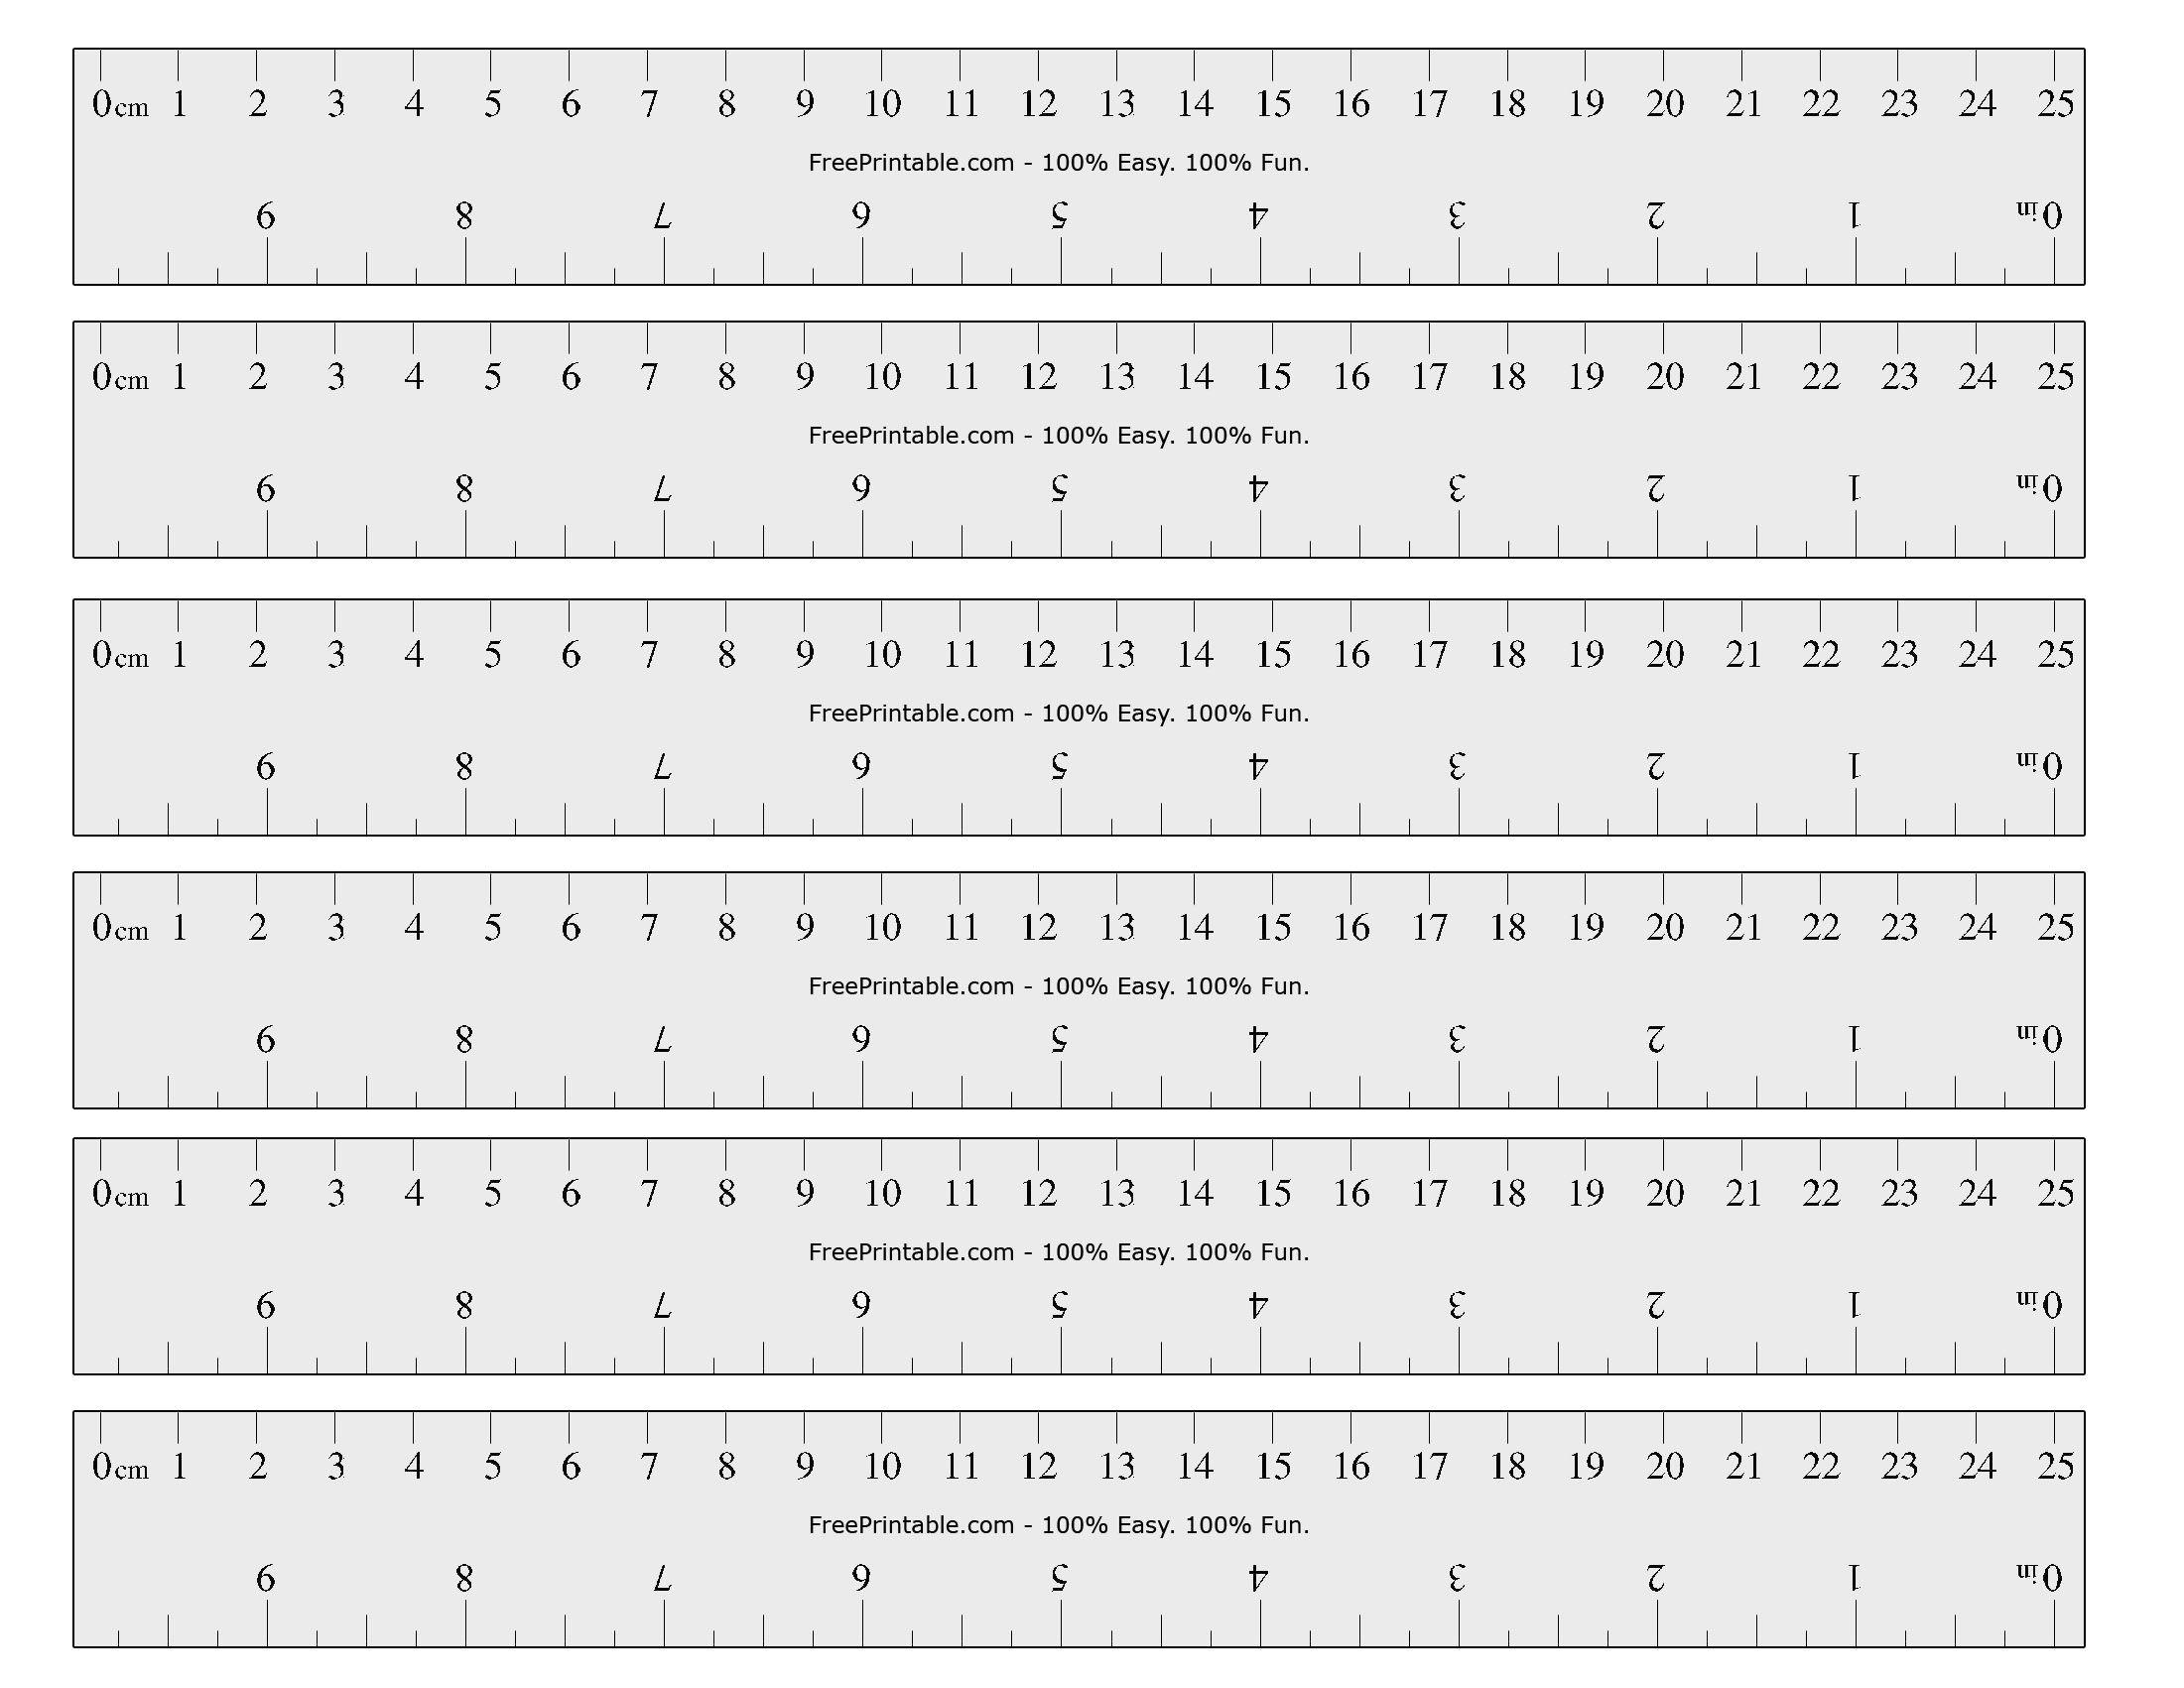 Free Printable Cm/inch Ruler | Printable Ruler, Printable